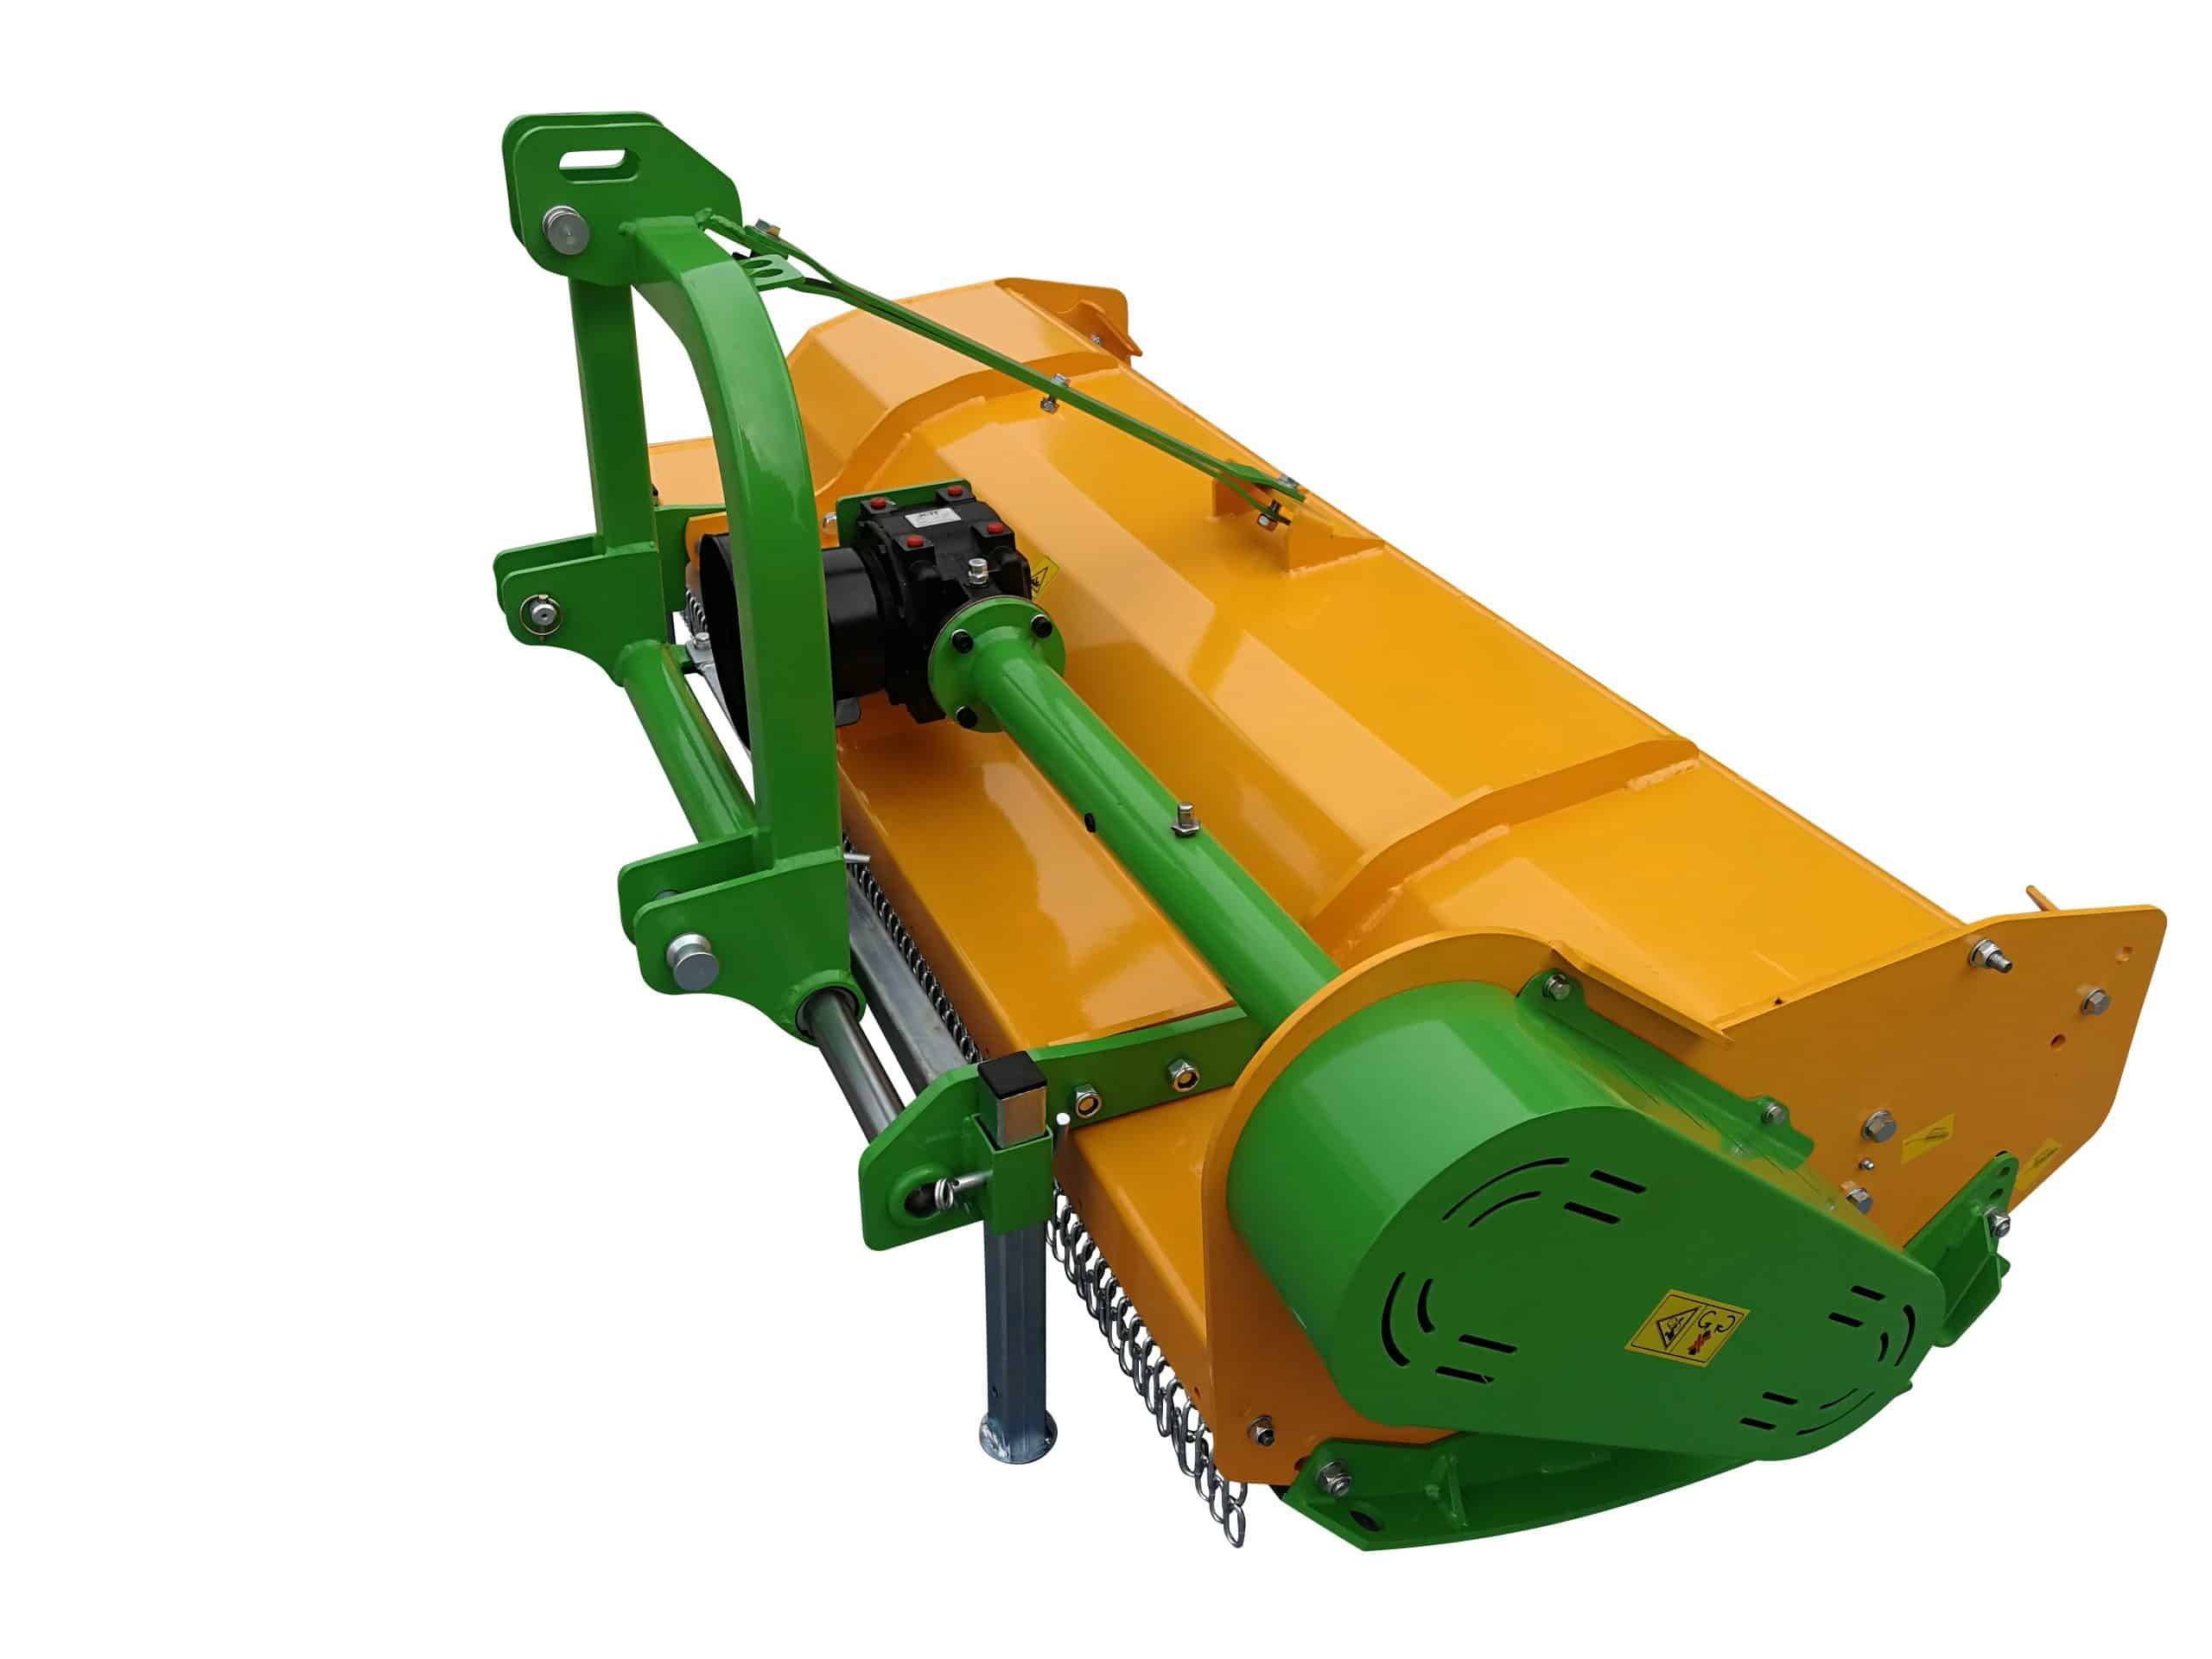 FMHD-78 Heavy Duty Flail Mower